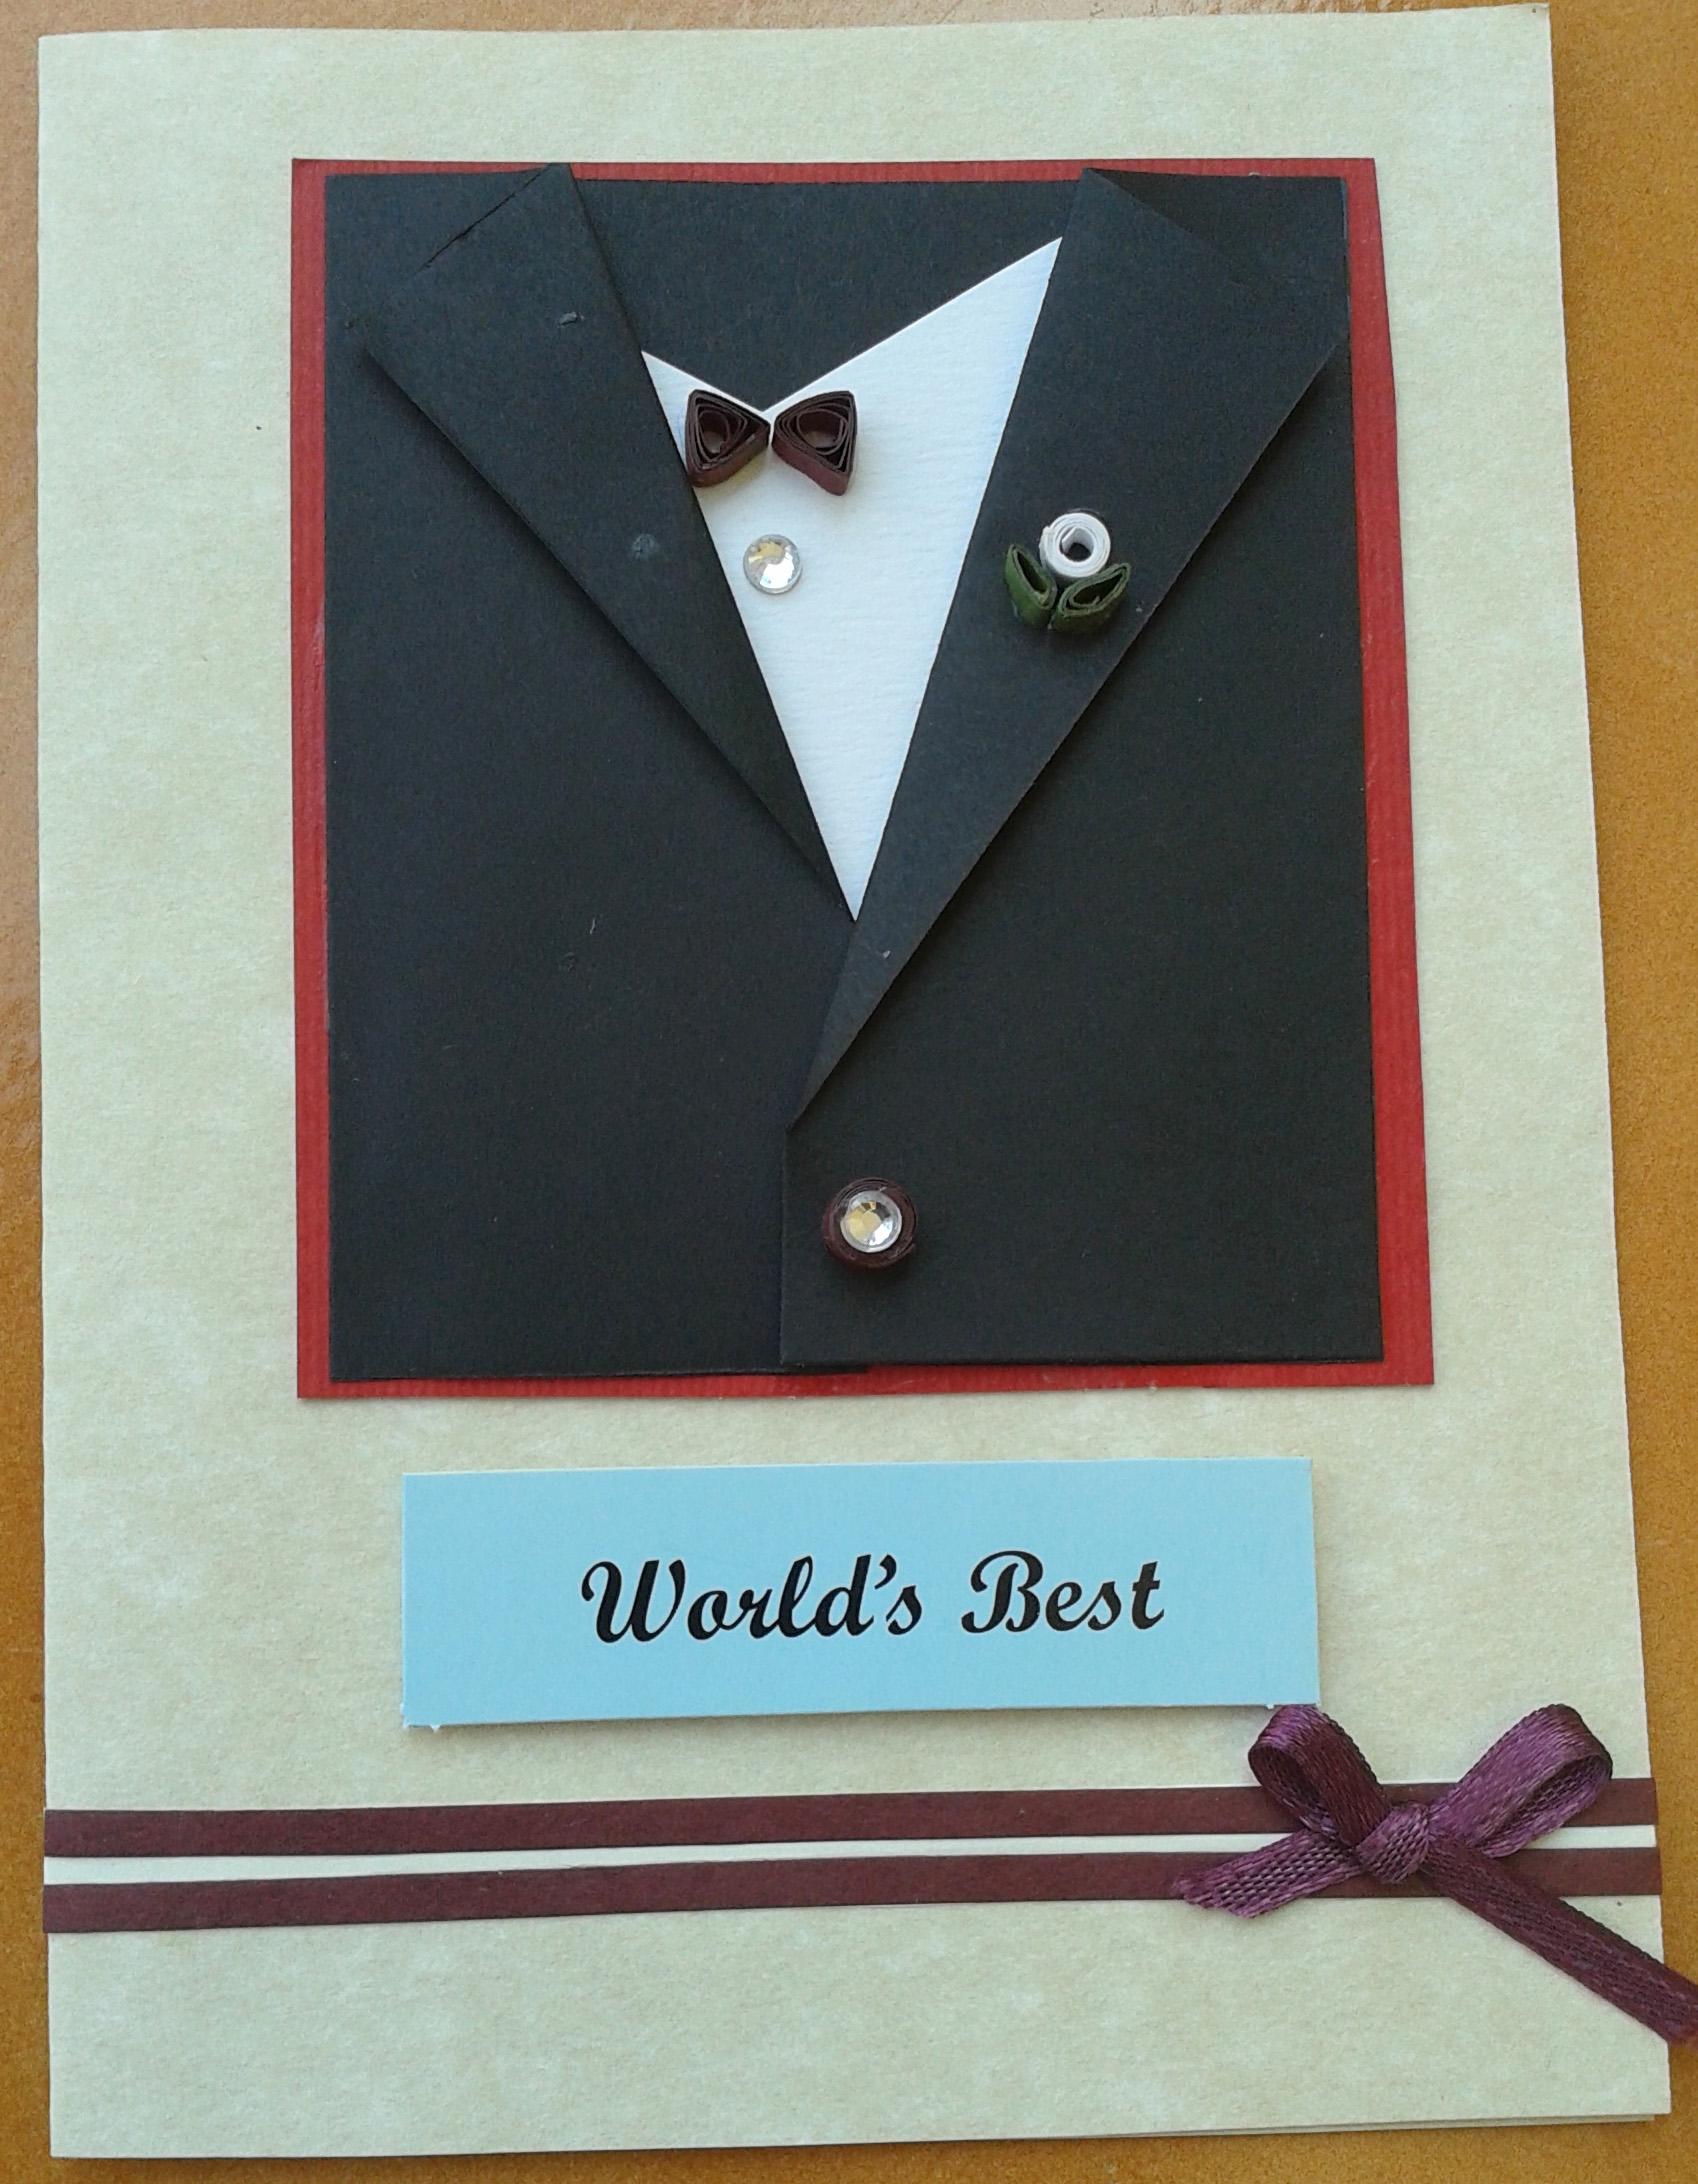 Buy World's Best Black Suit Card For Him ShipMyCard Com